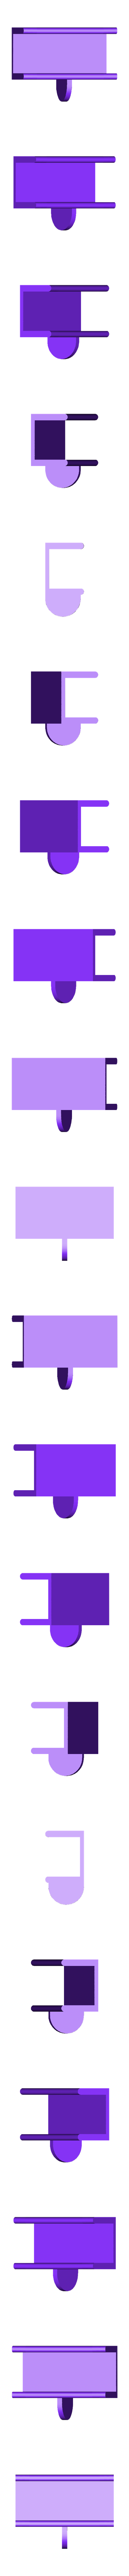 bi_fold_lock.stl Download free STL file Bi-Fold Door Toddler Lock • 3D printer object, Urulysman